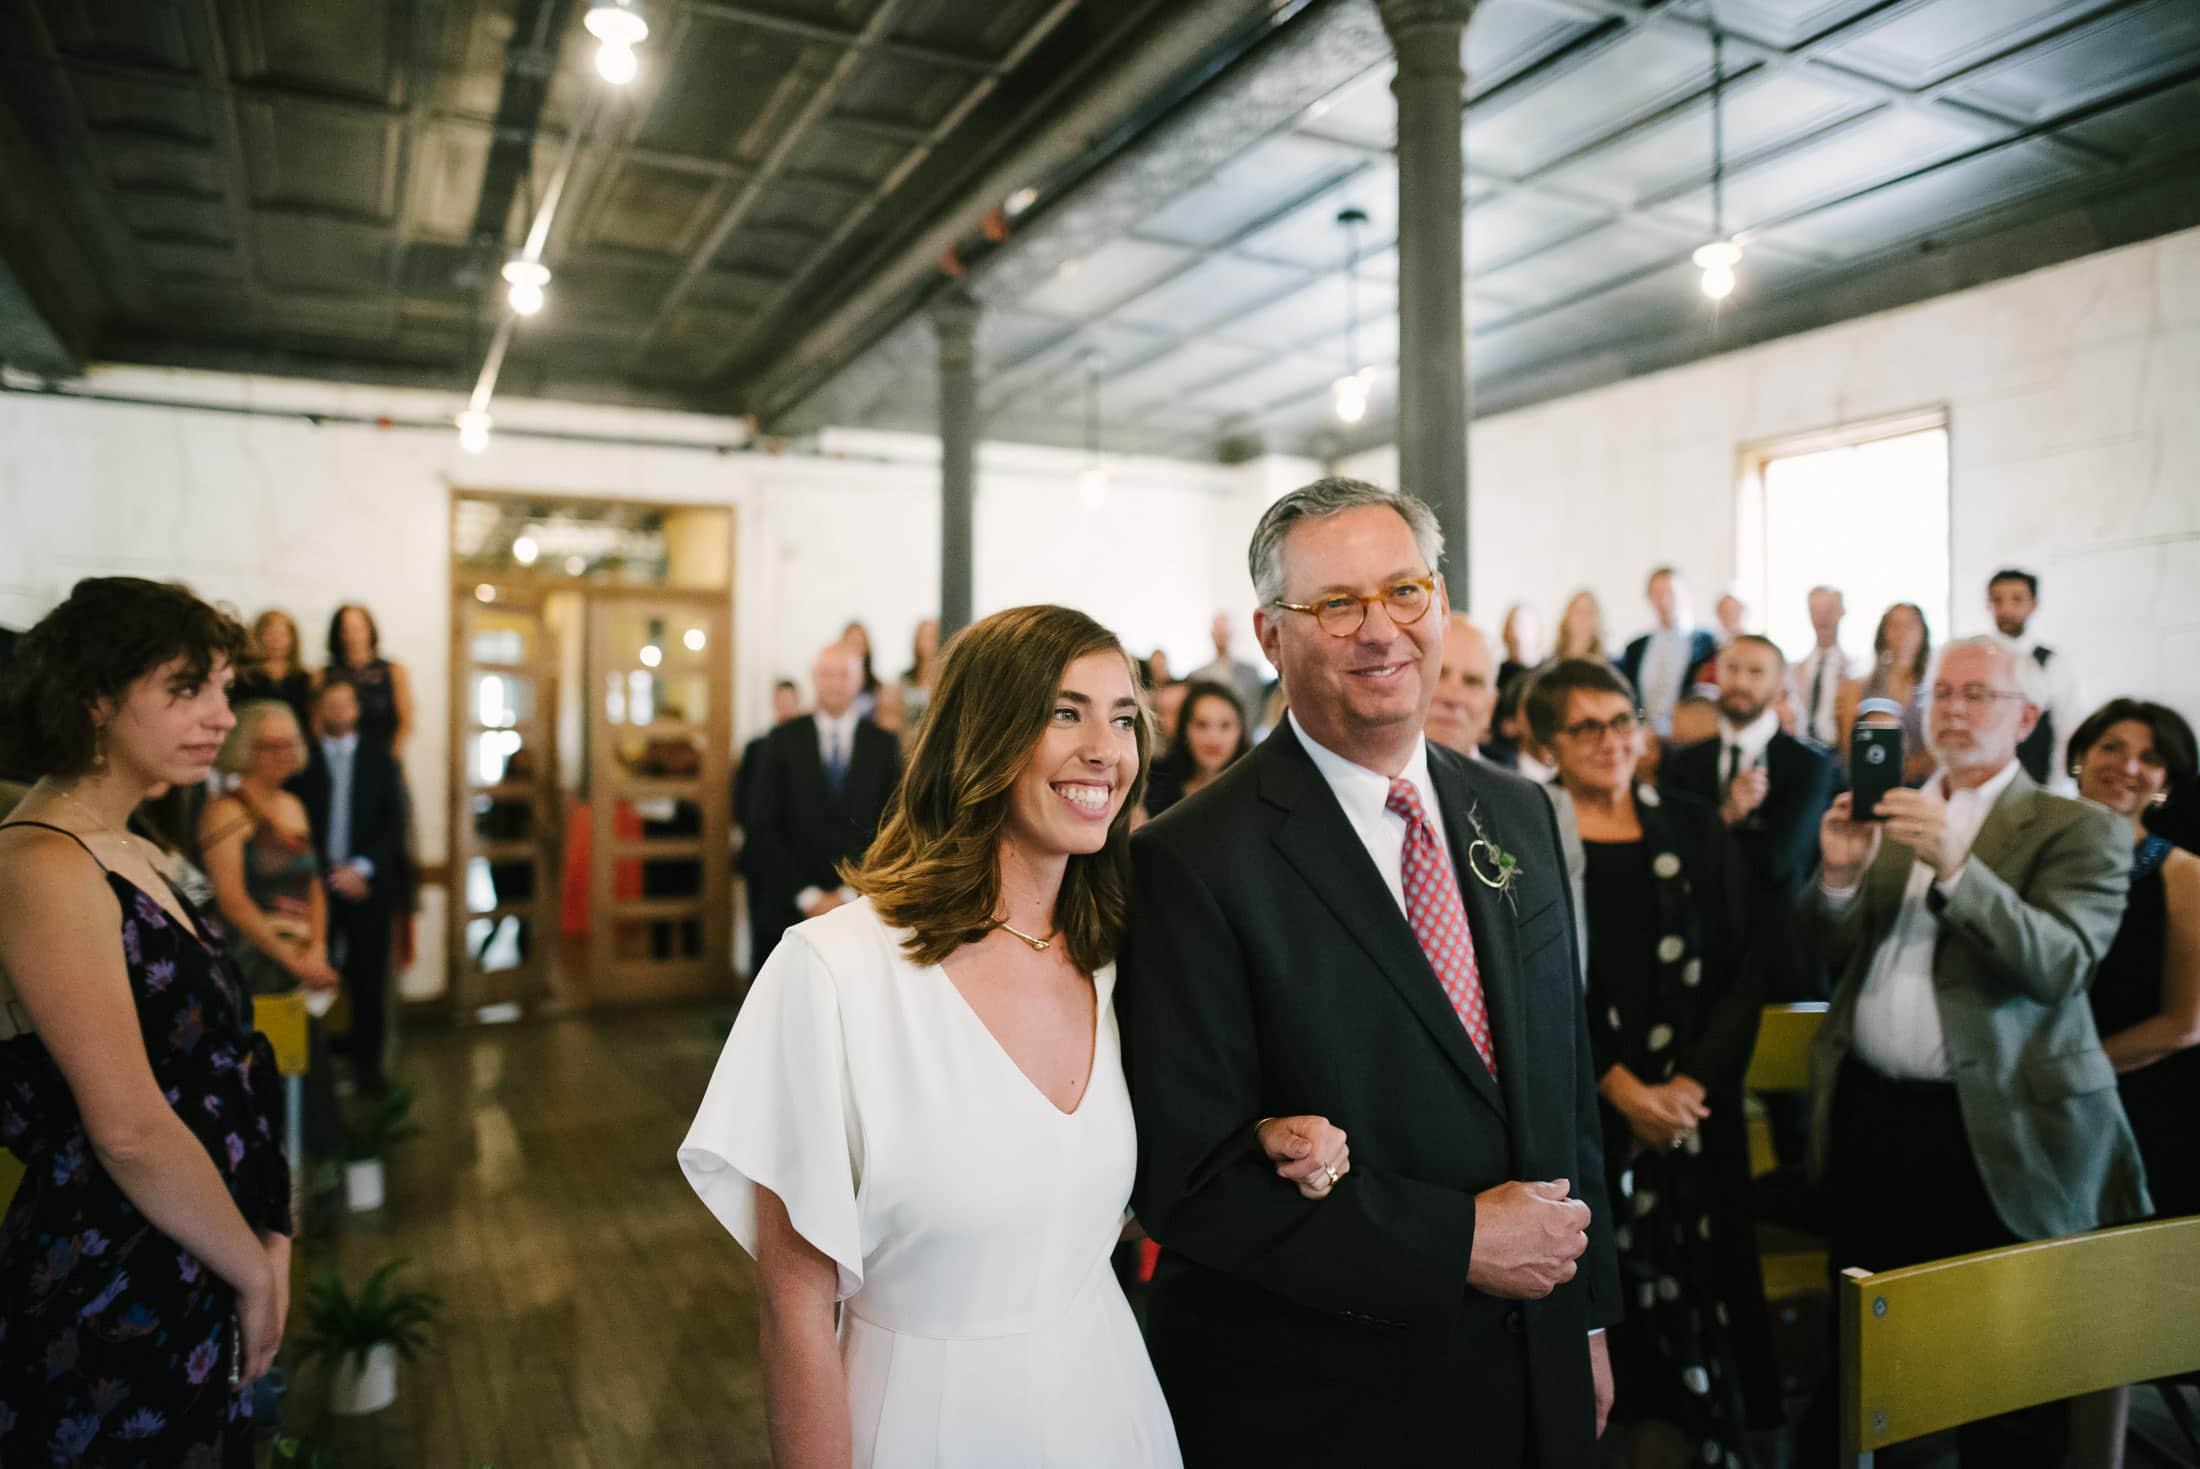 Marin Headland Center for the Arts Wedding Ceremony